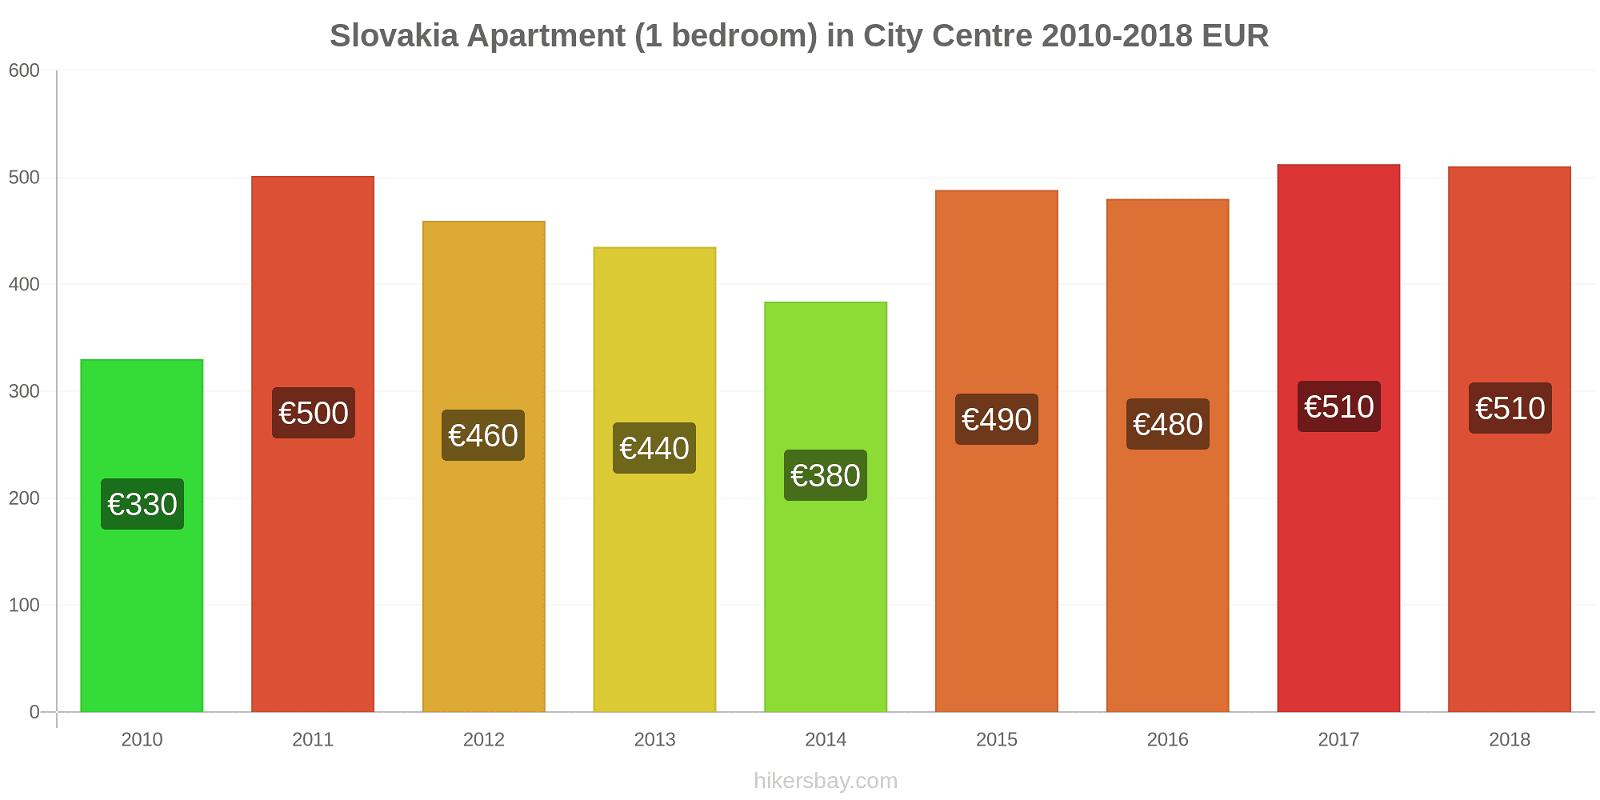 Slovakia price changes Apartment (1 bedroom) in City Centre hikersbay.com